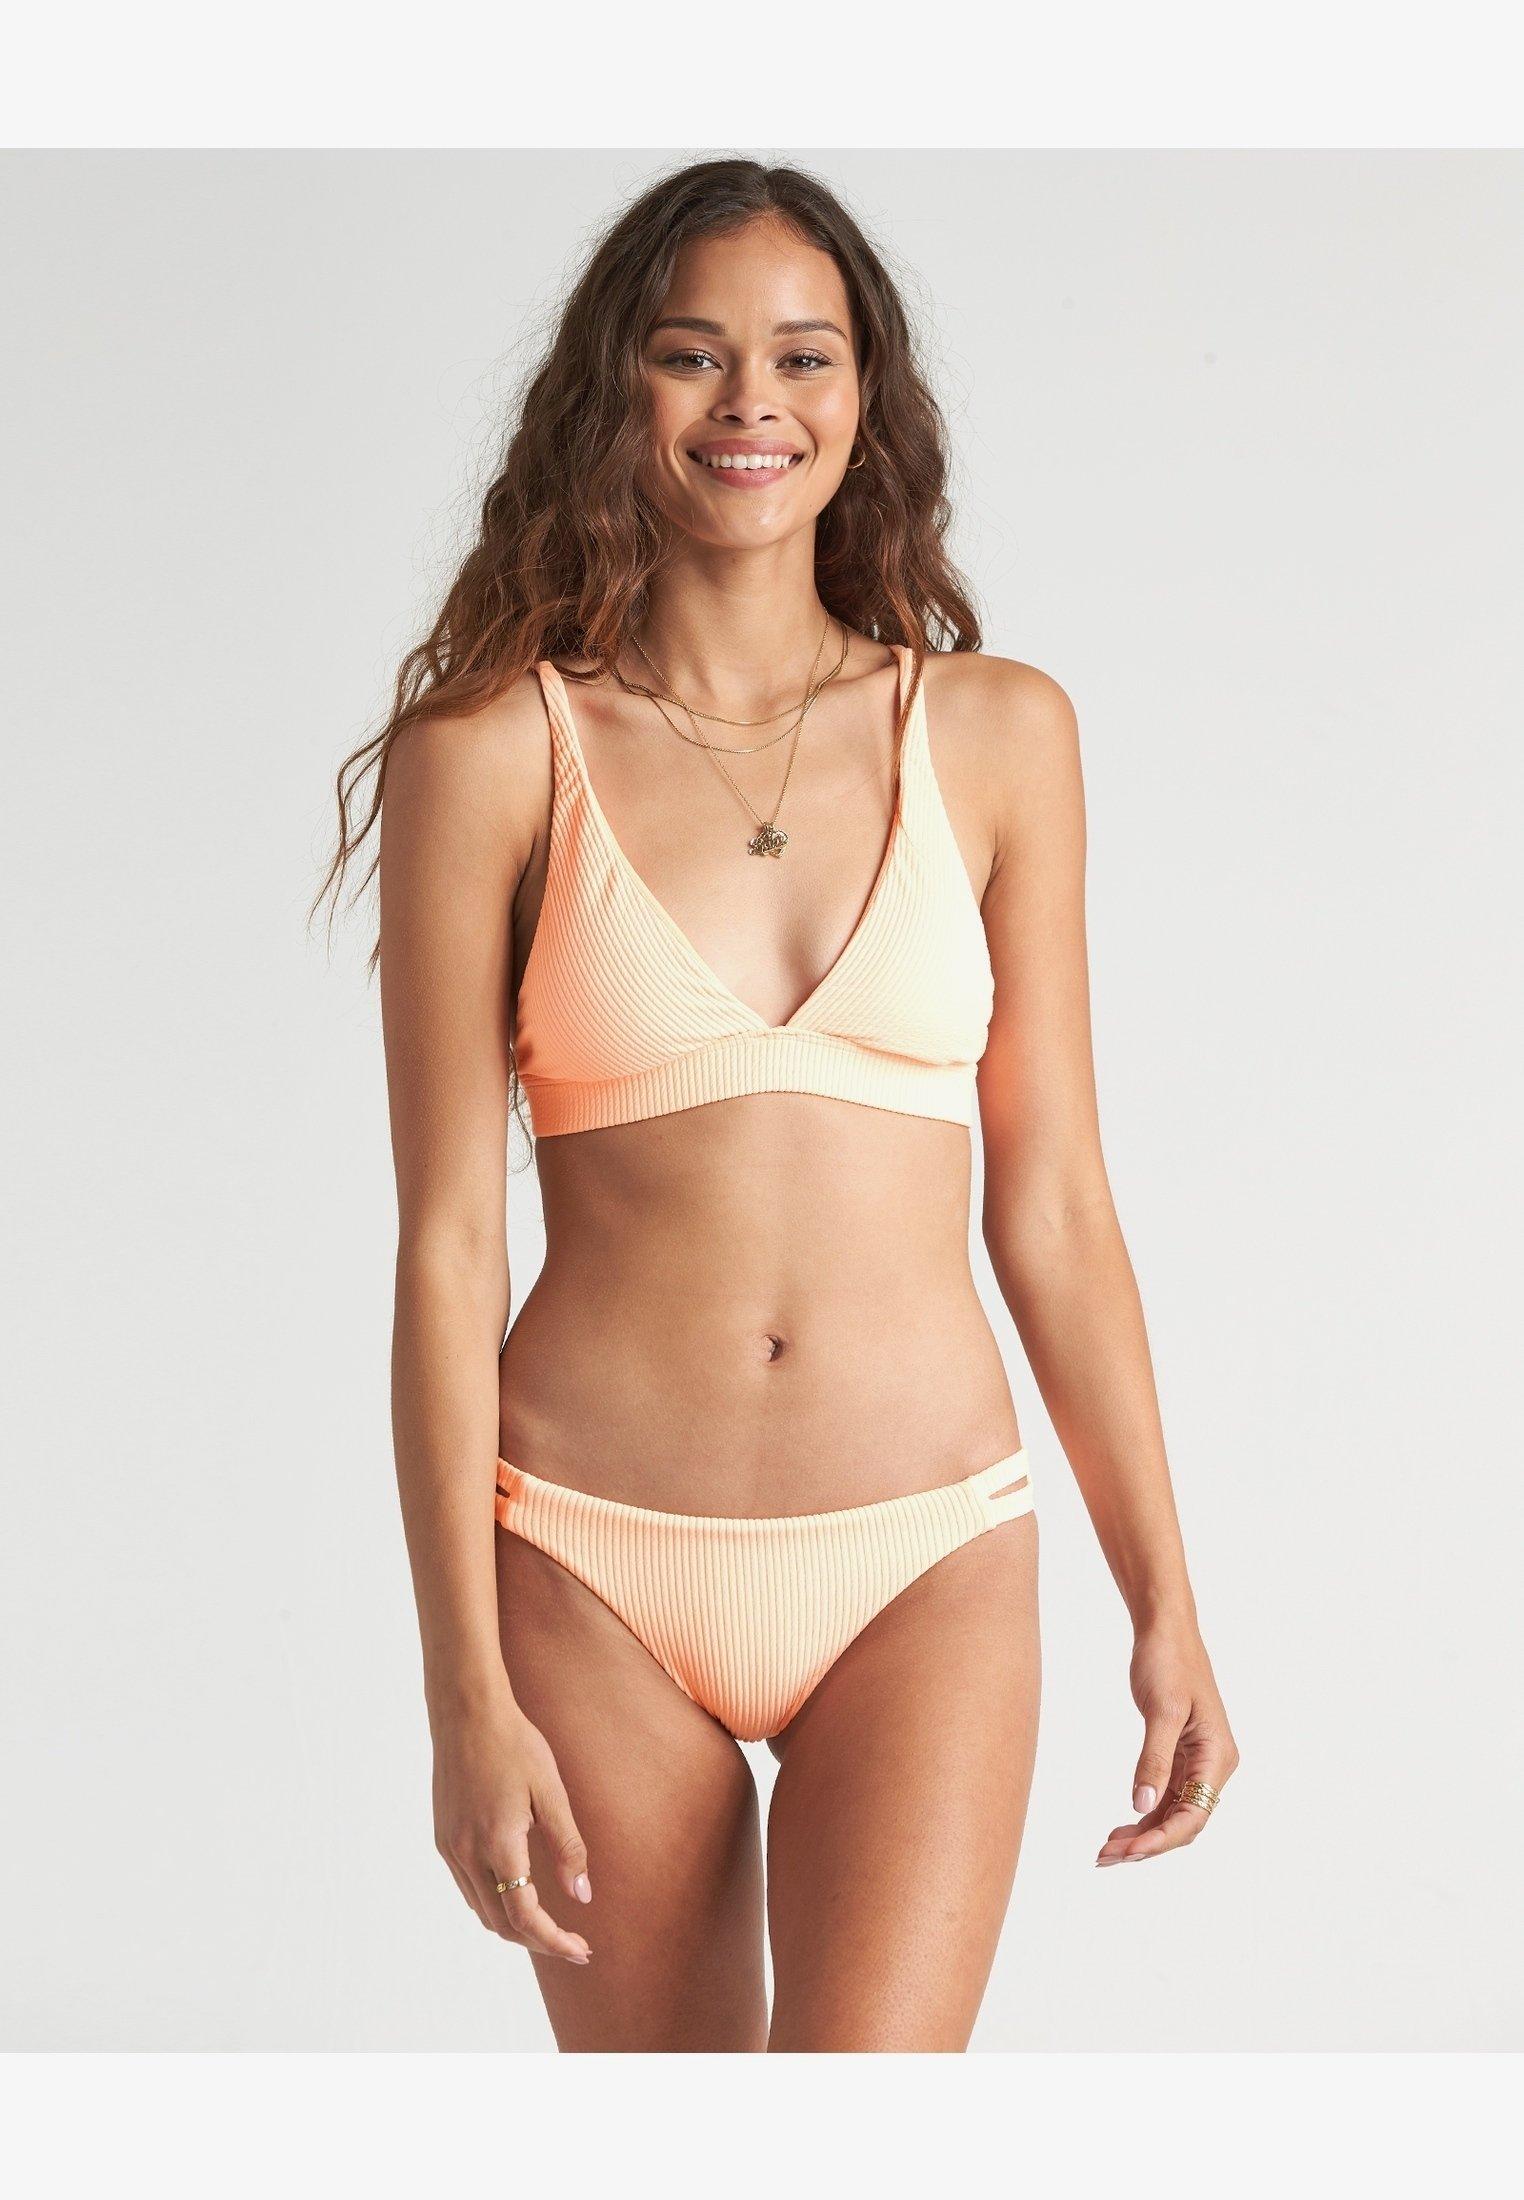 Femme UNDER THE SUN - Bas de bikini